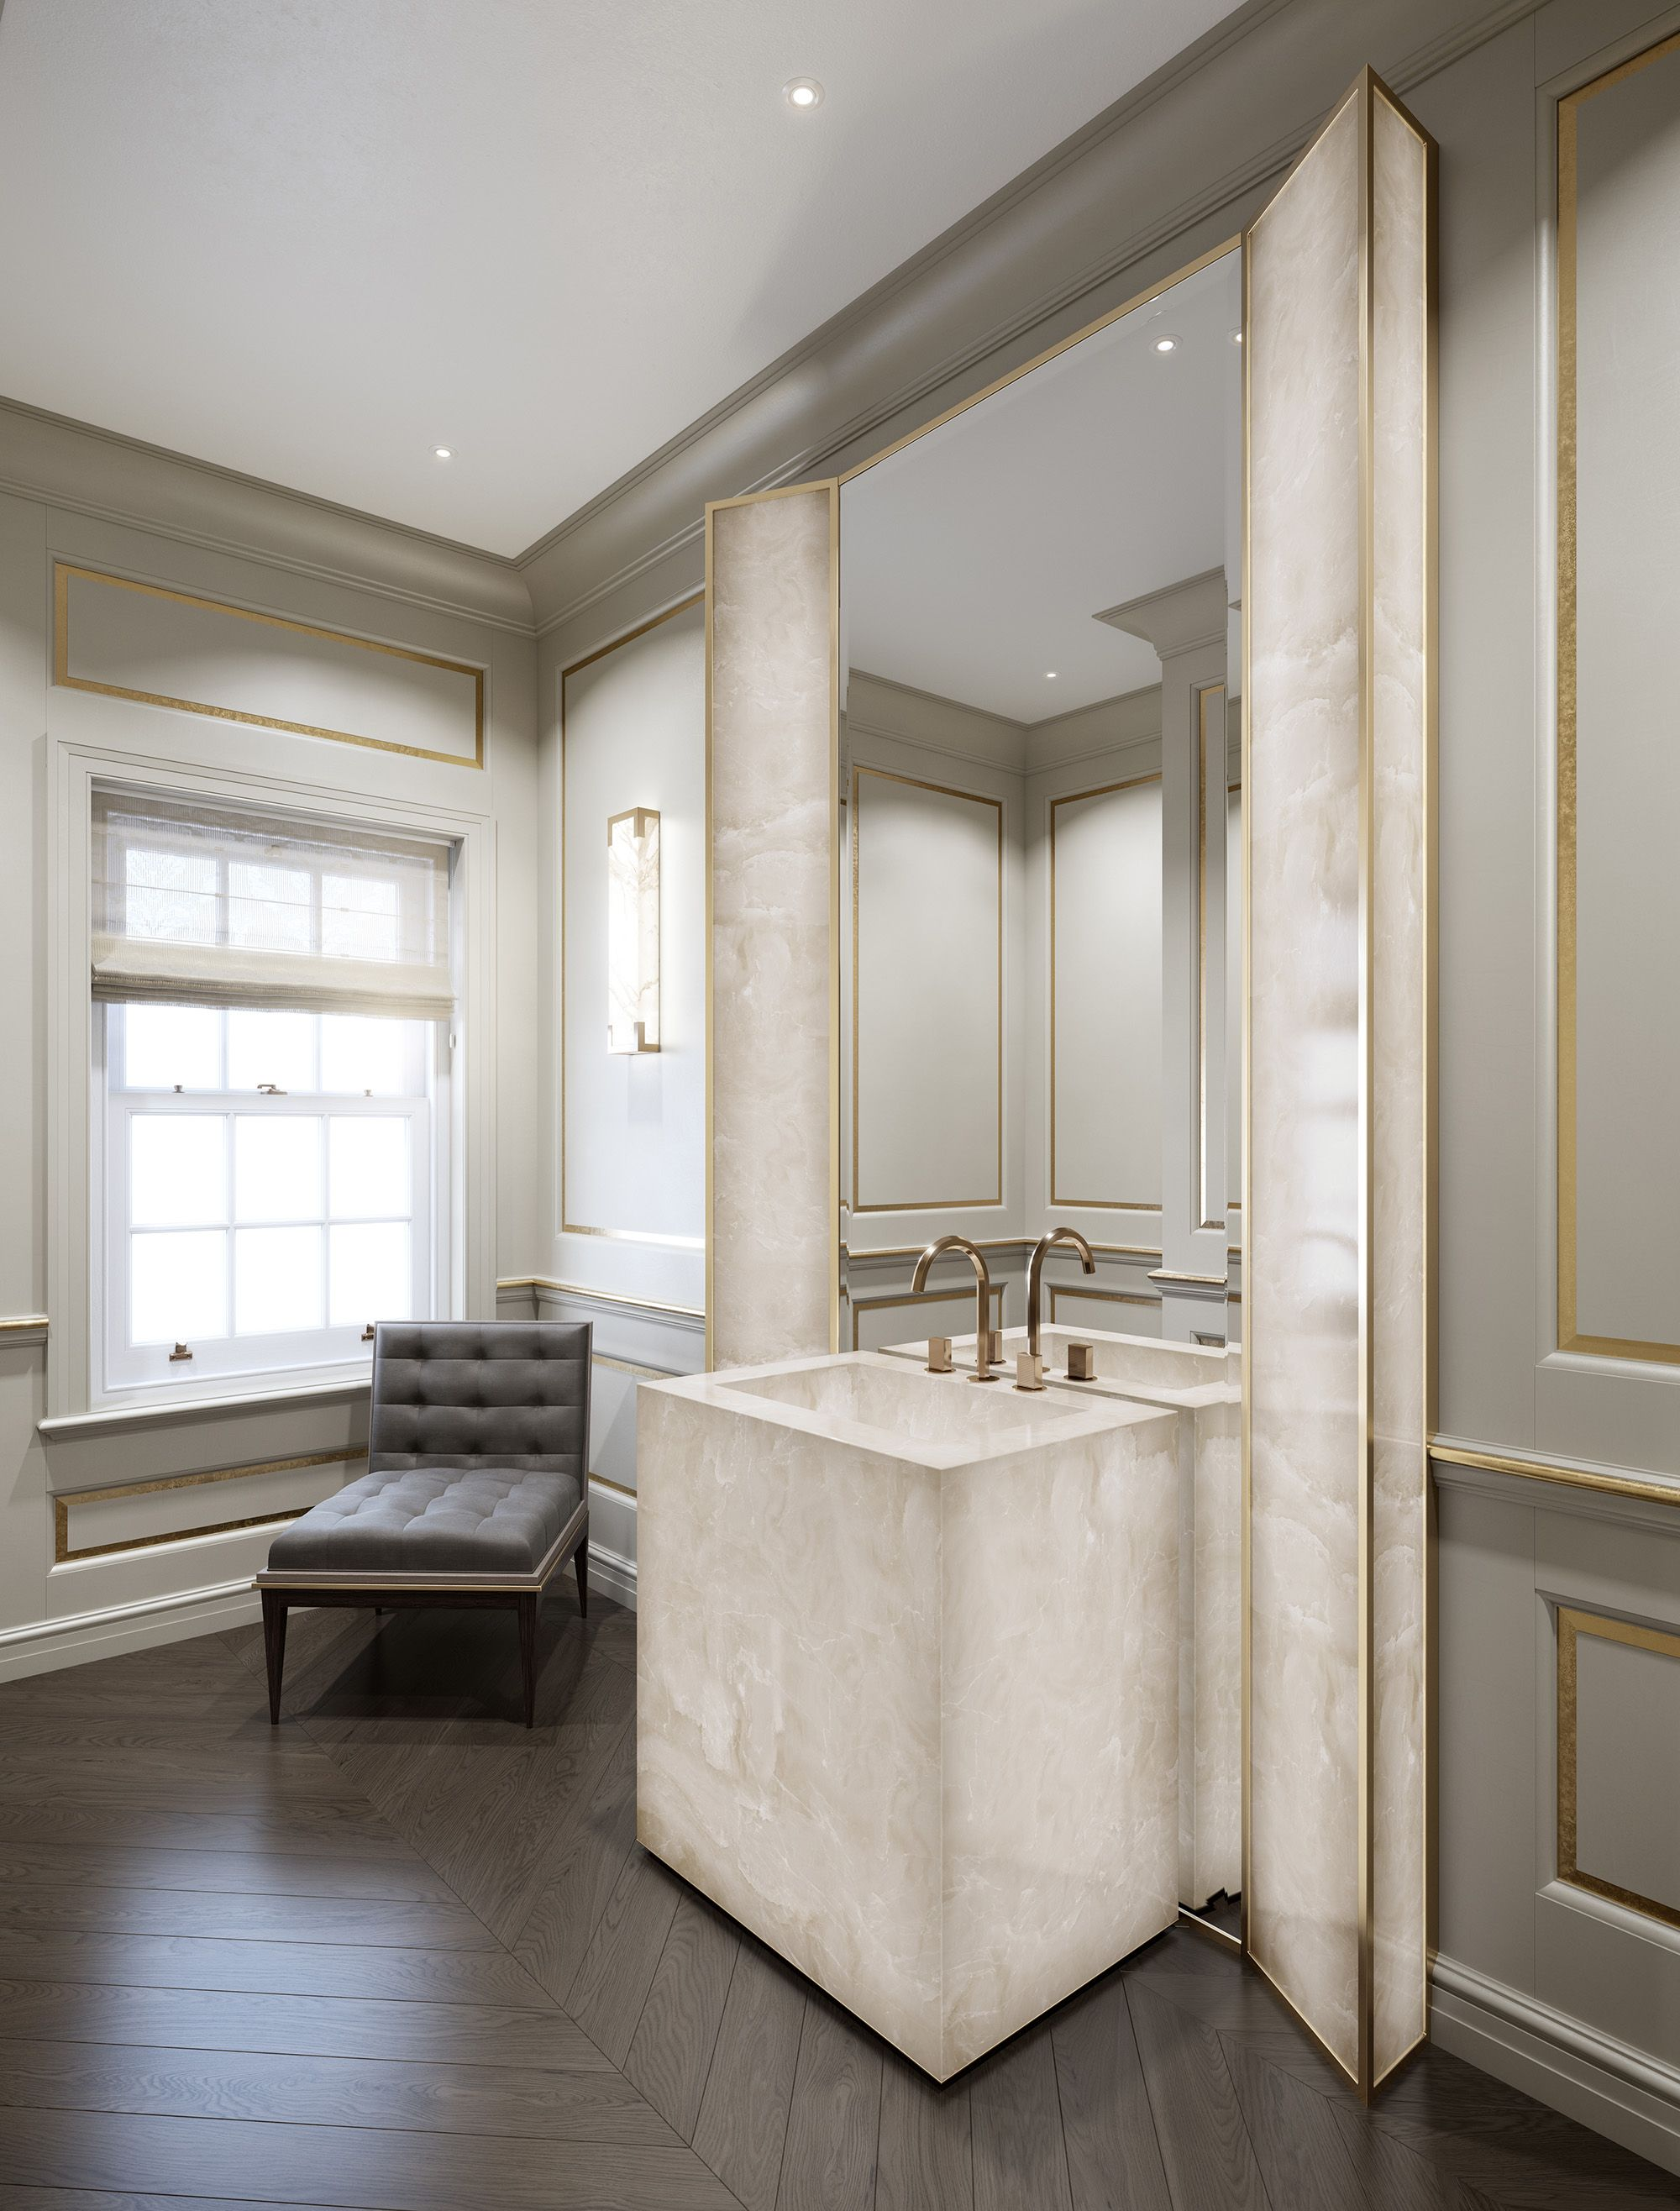 Interior design of bathroom arcmedia cgi of laura hammett interior design  interior design